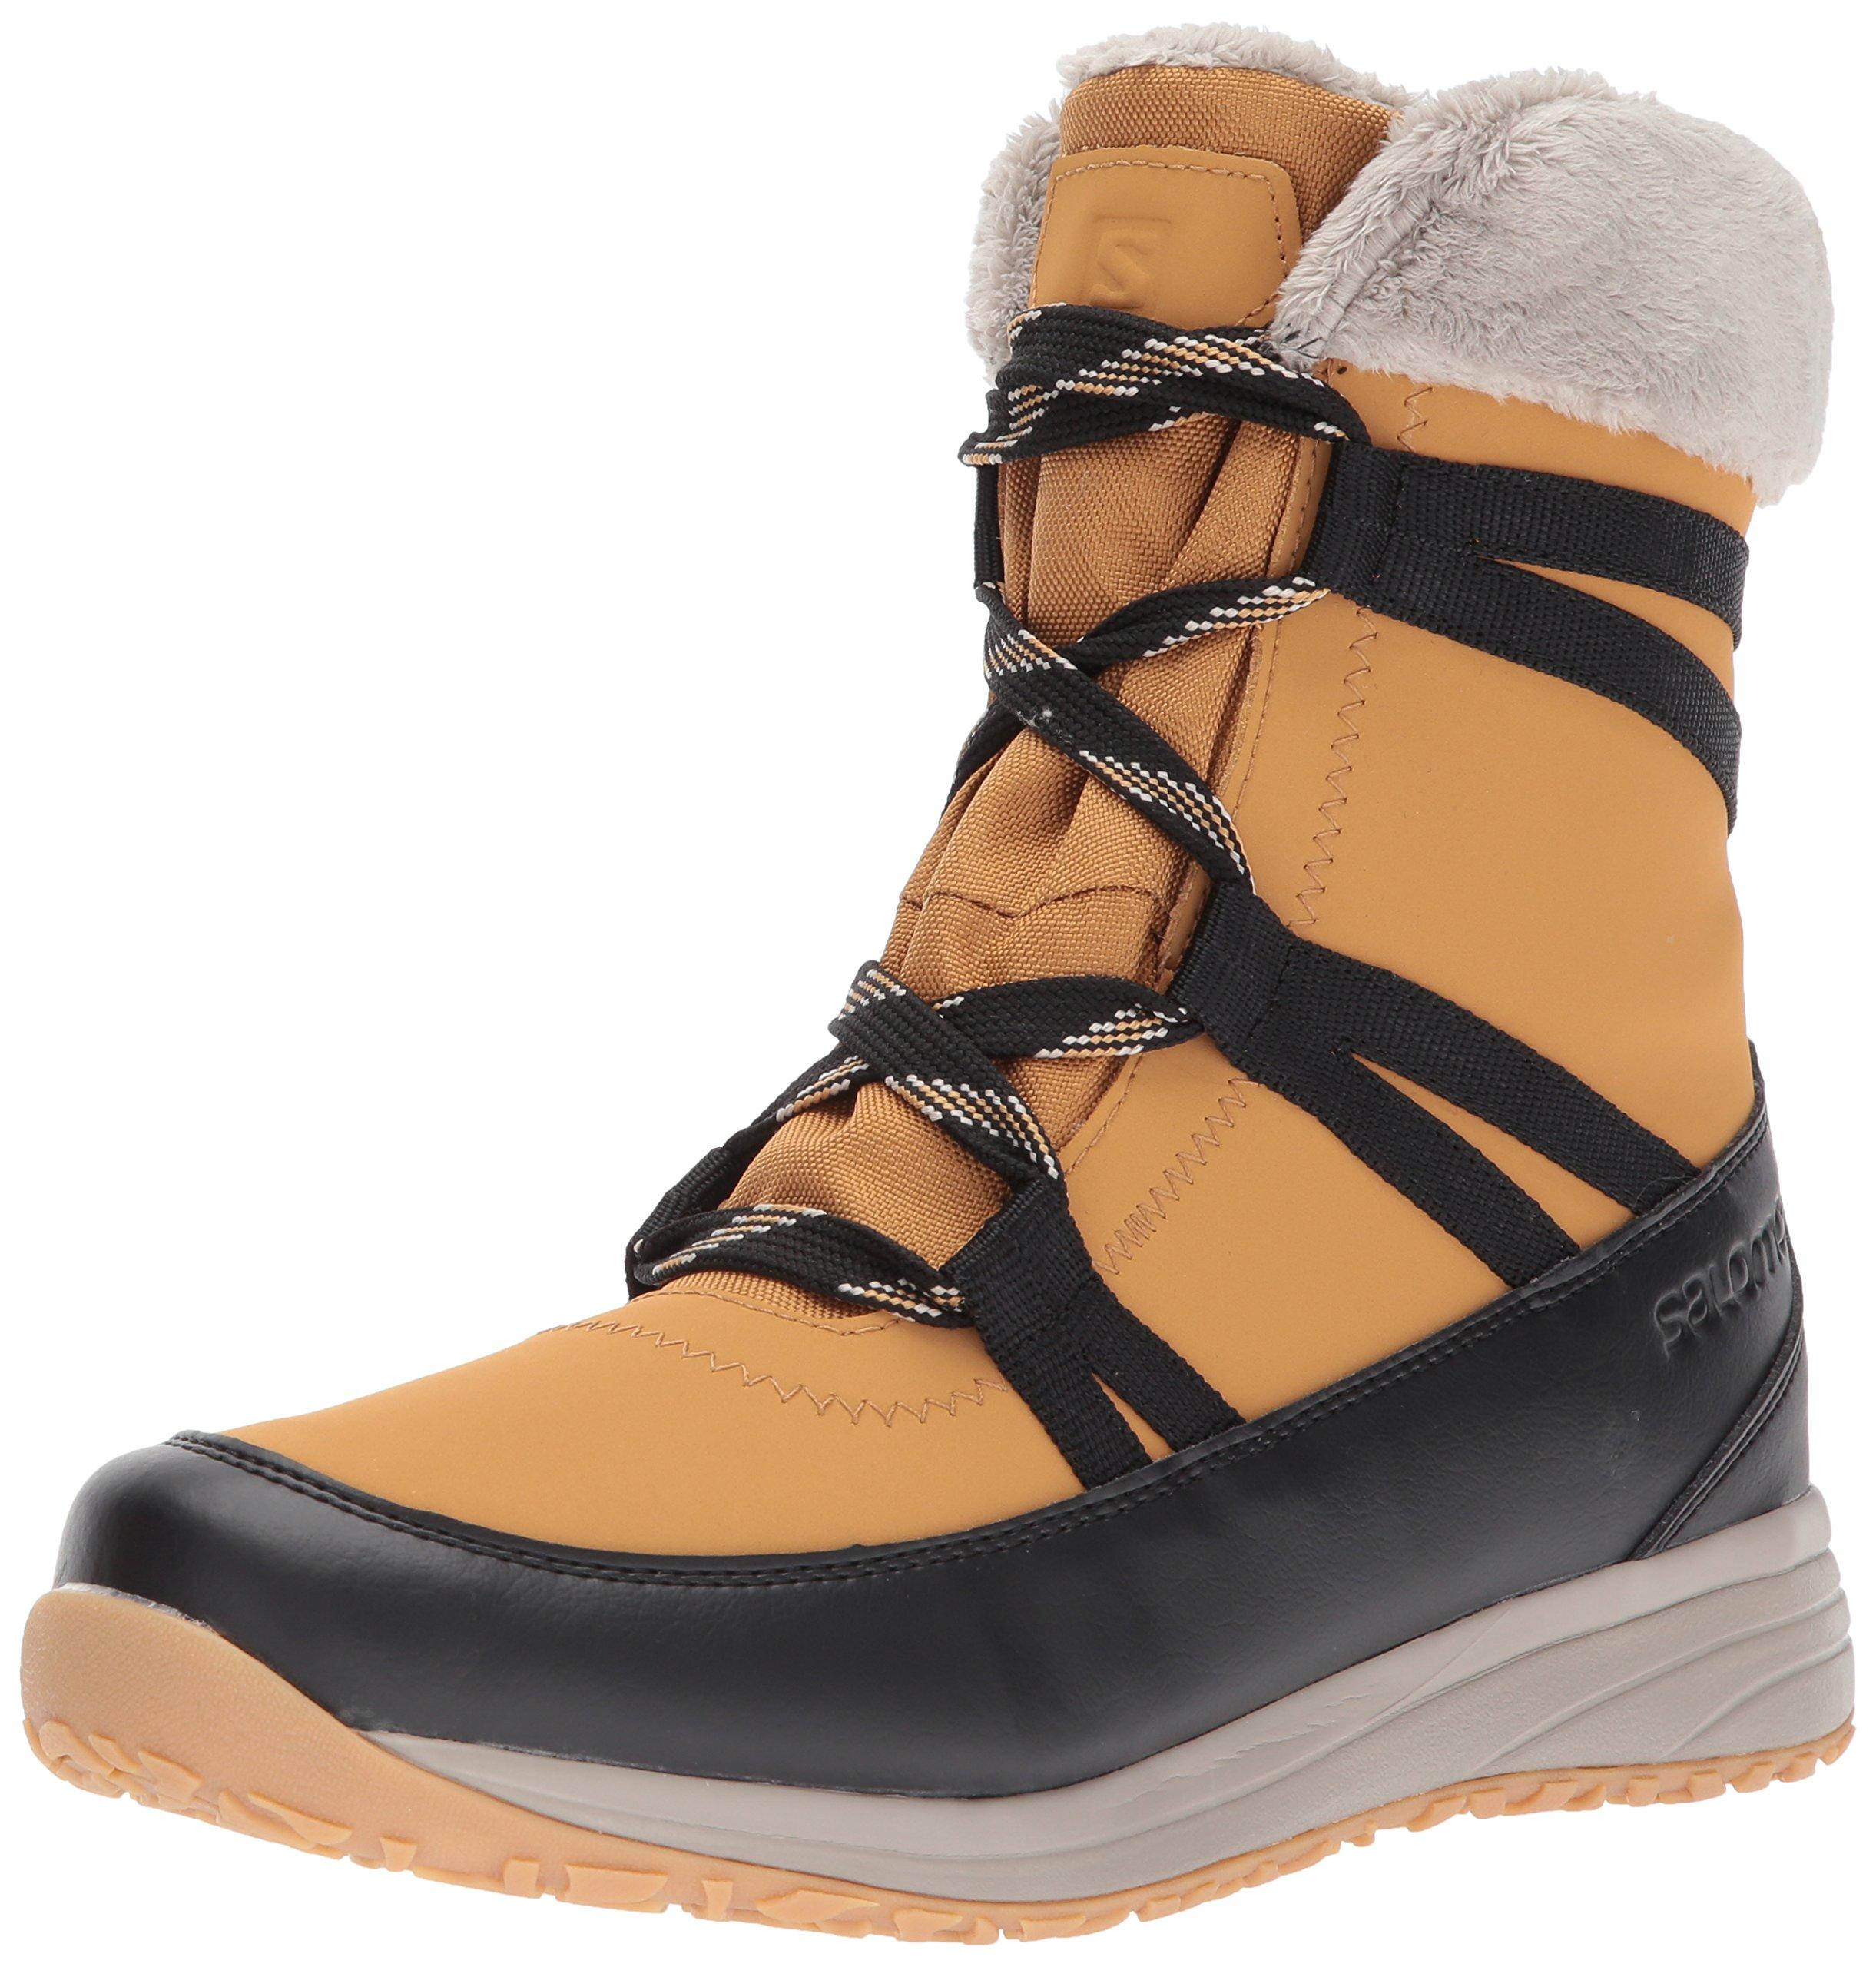 Salomon Women's Heika LTR CS Waterproof Snow Boot, Camel Gold Leather/Black/Vintage Kaki, 5 M US